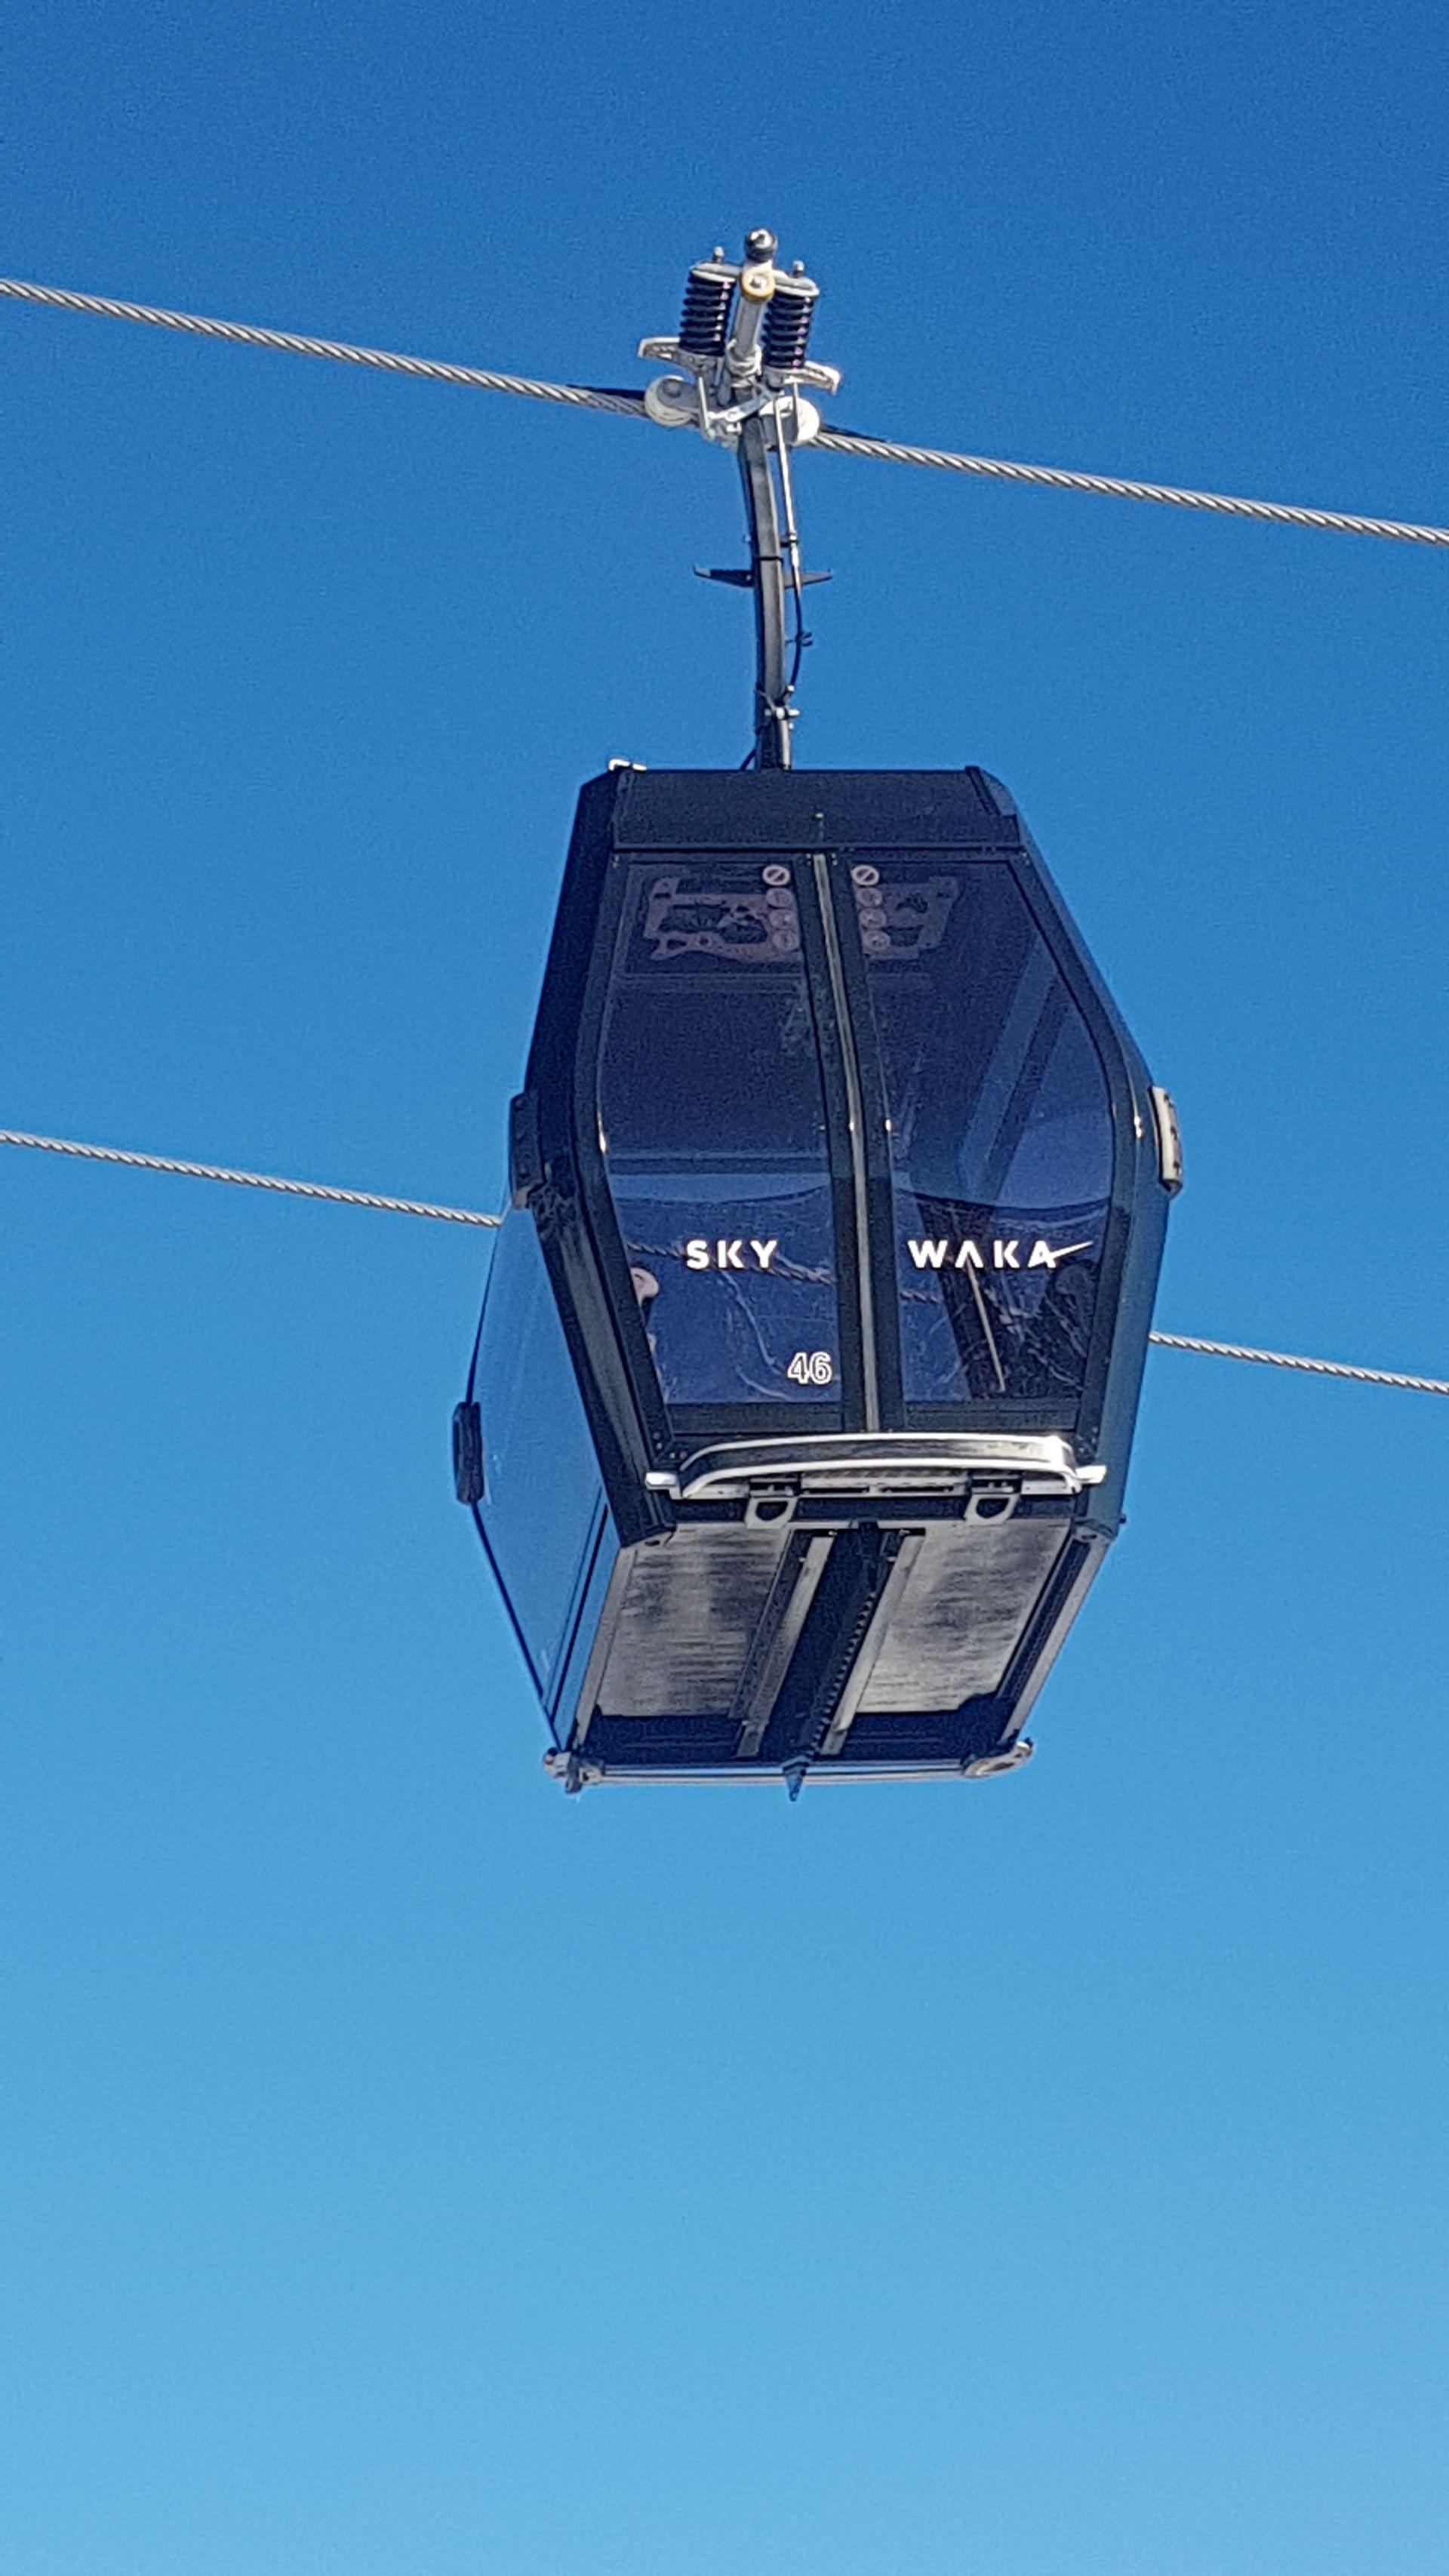 Sky Waka Gondola.jpg